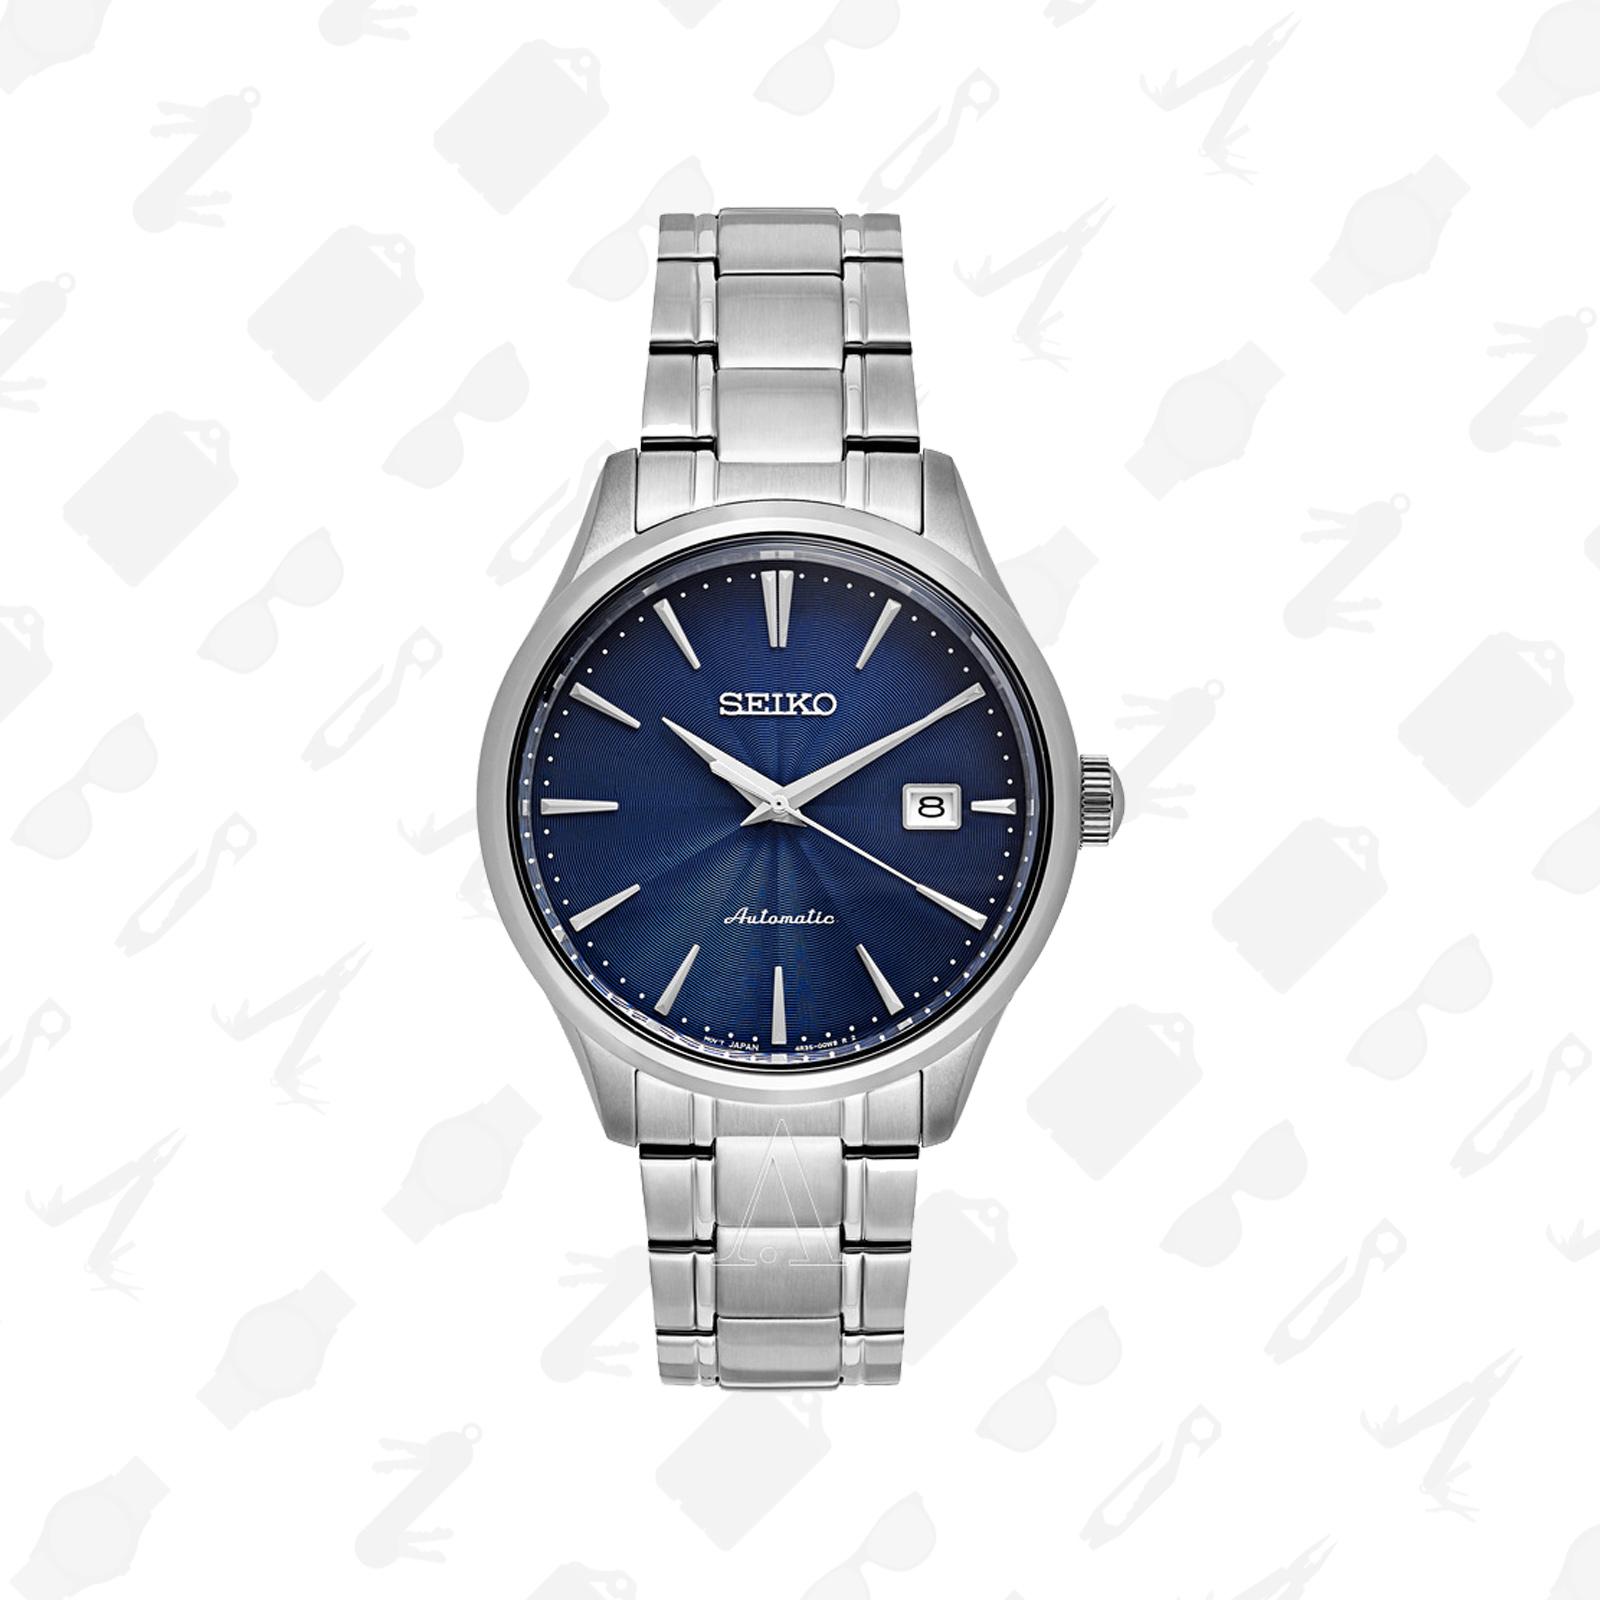 Seiko Core Watch | $135 | Ashford